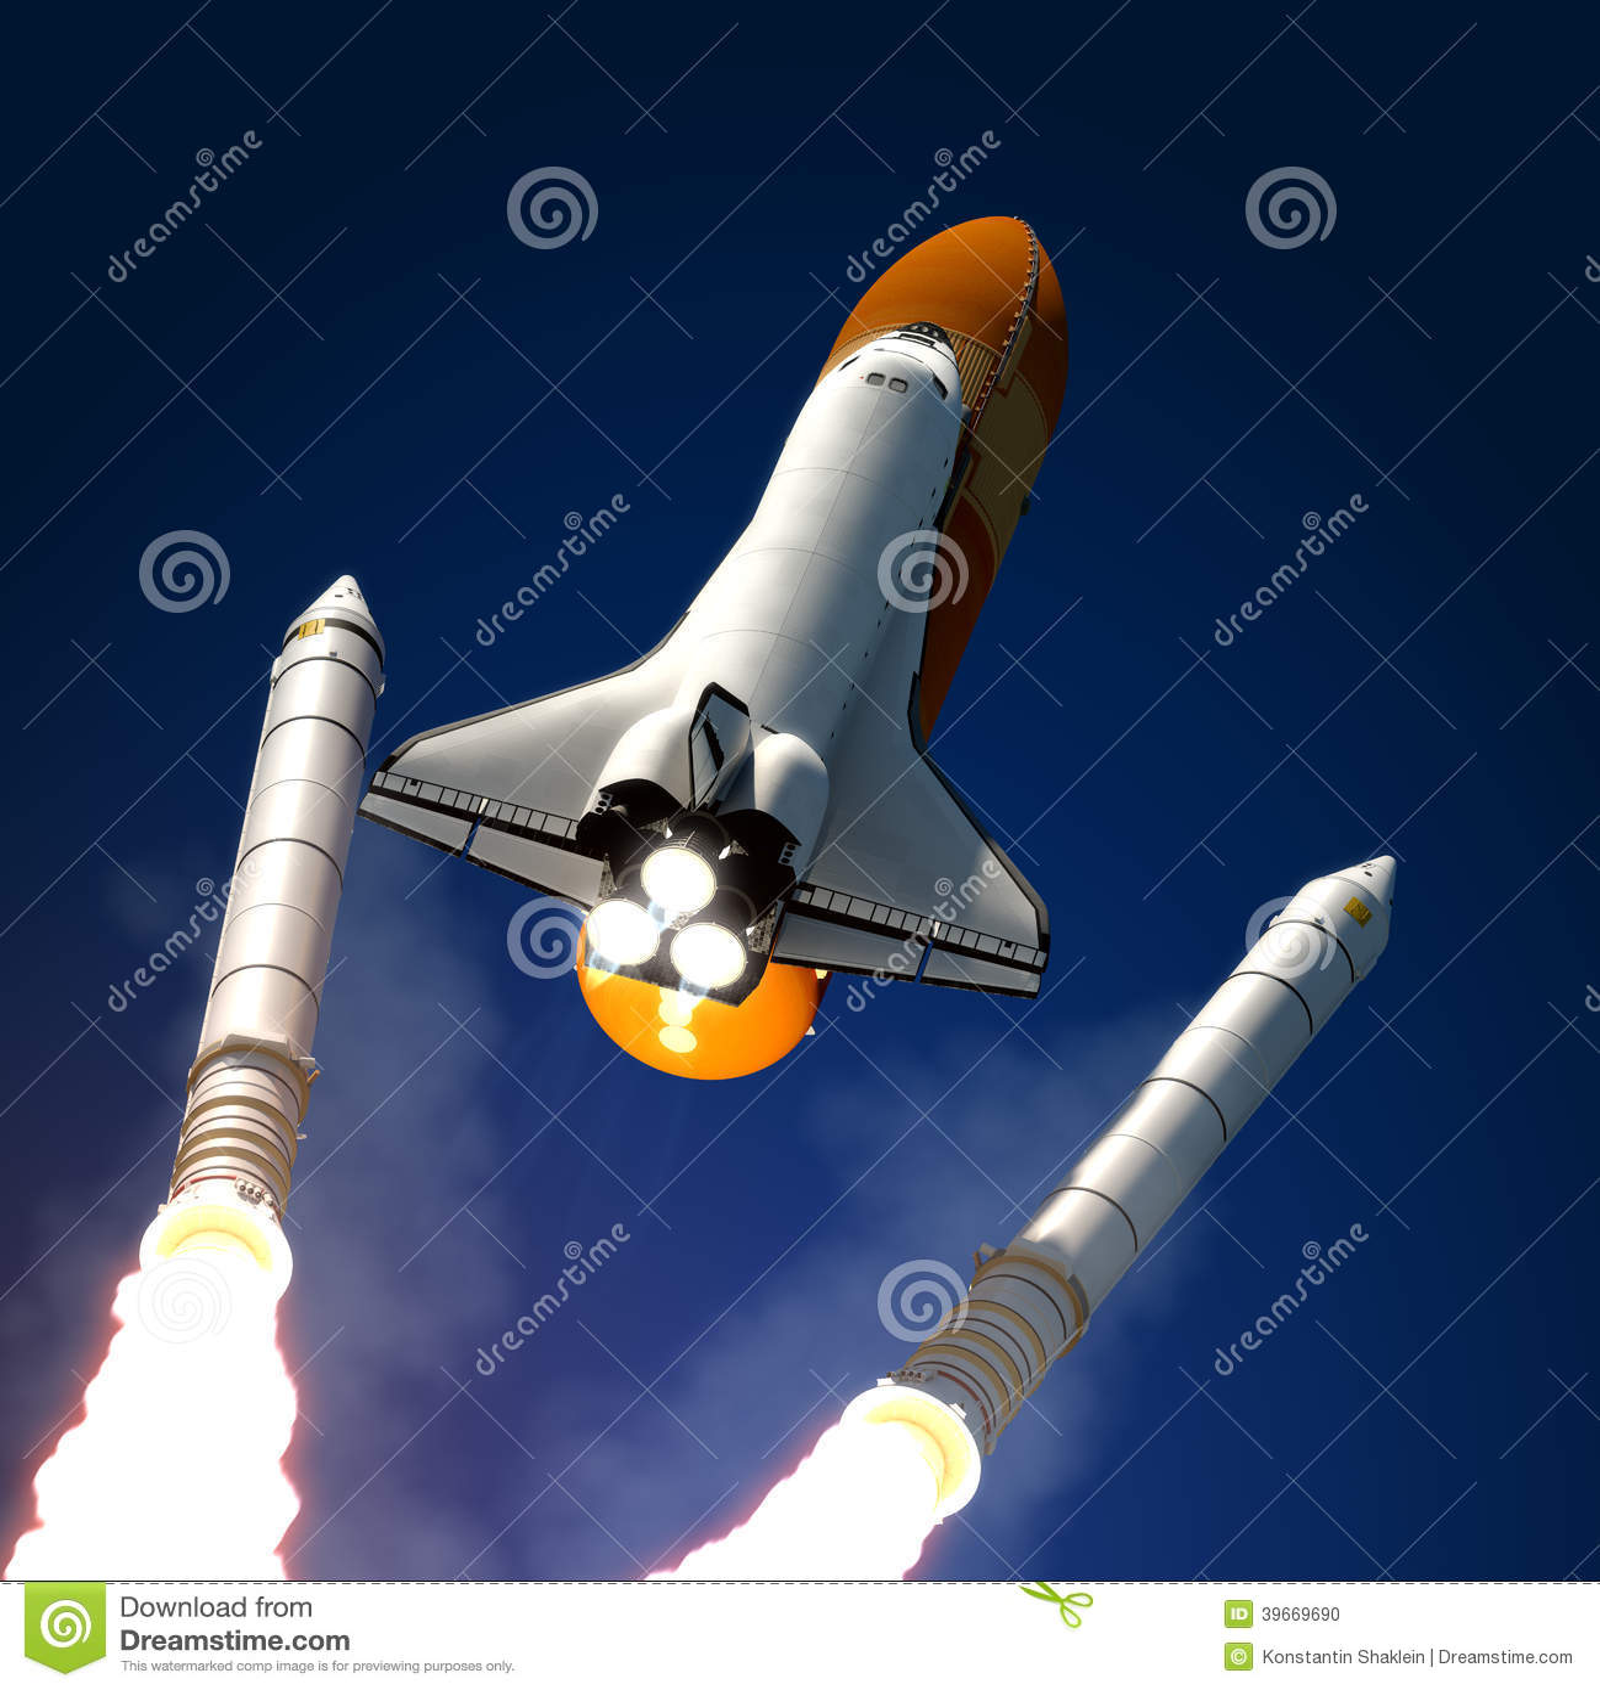 Space Shuttle Solid Rocket Buster Detached.